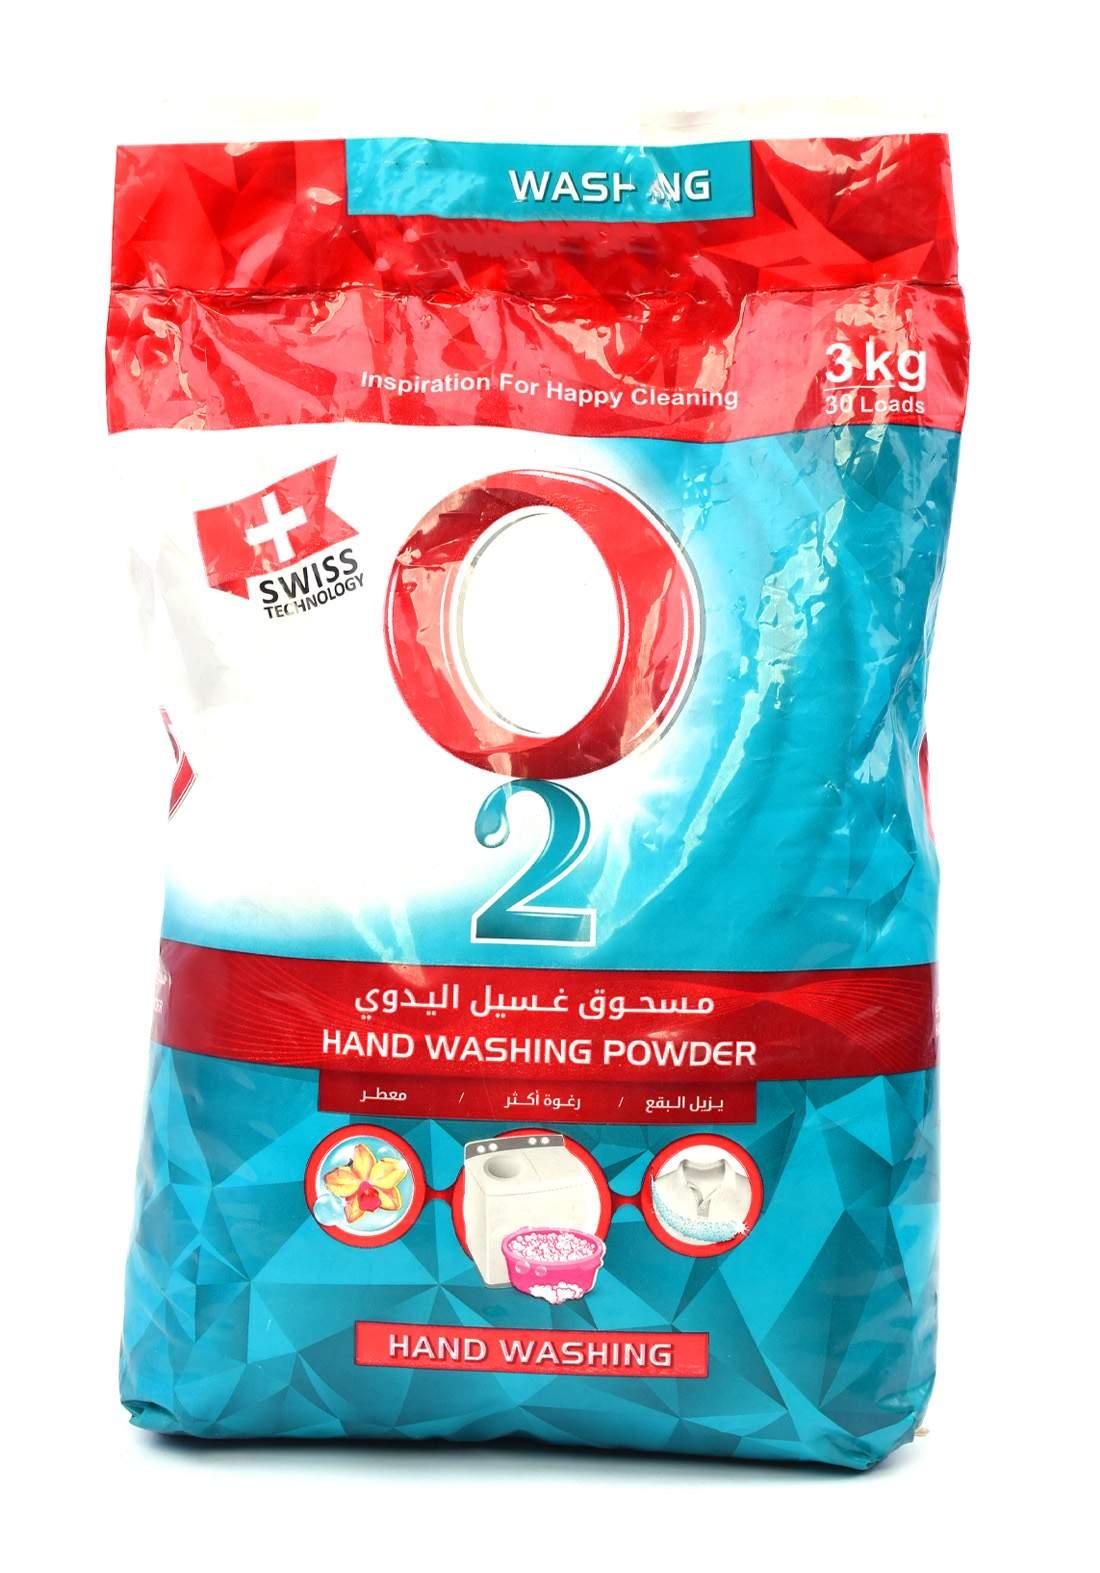 O2 Washing Powder Flowers  3 Kg    مسحوق غسيل الملابس للغسالات العادية والغسل اليدوي